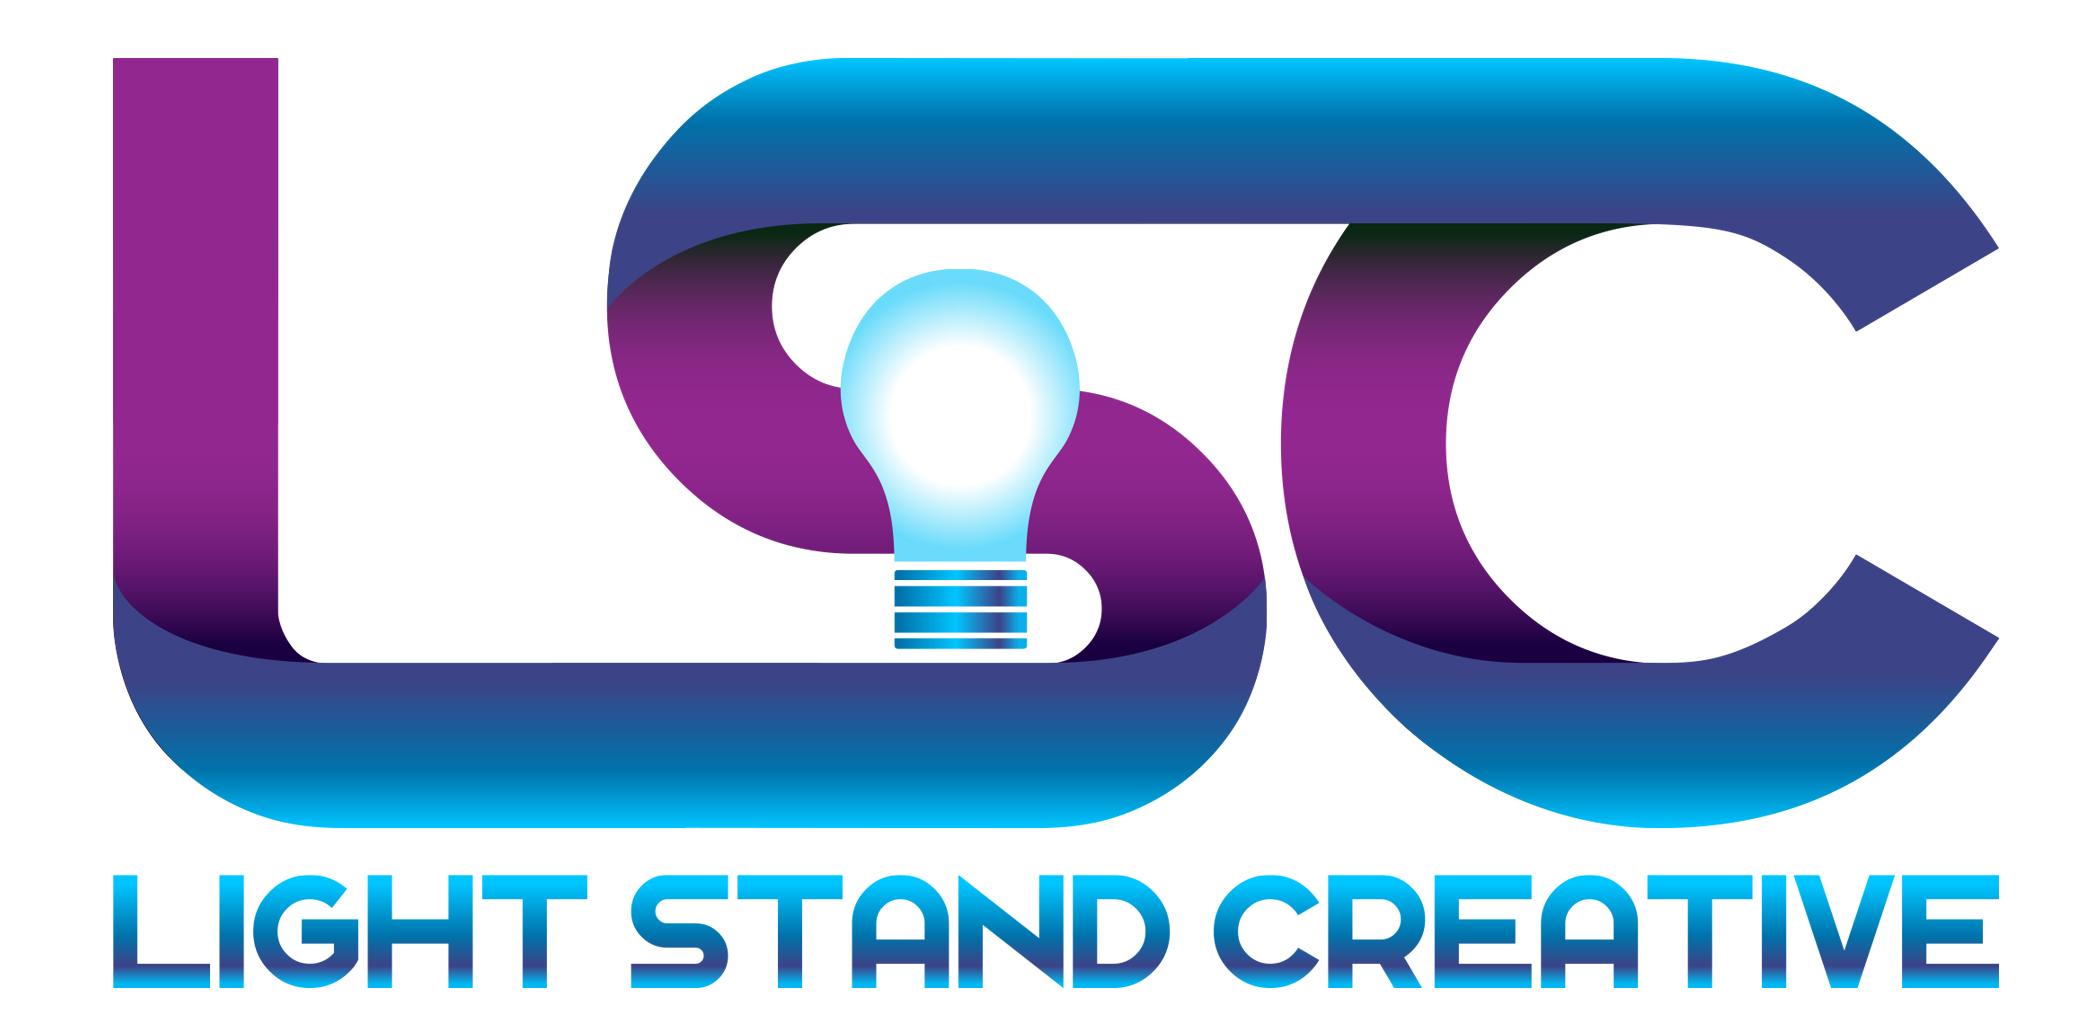 ...light stand creative logo...